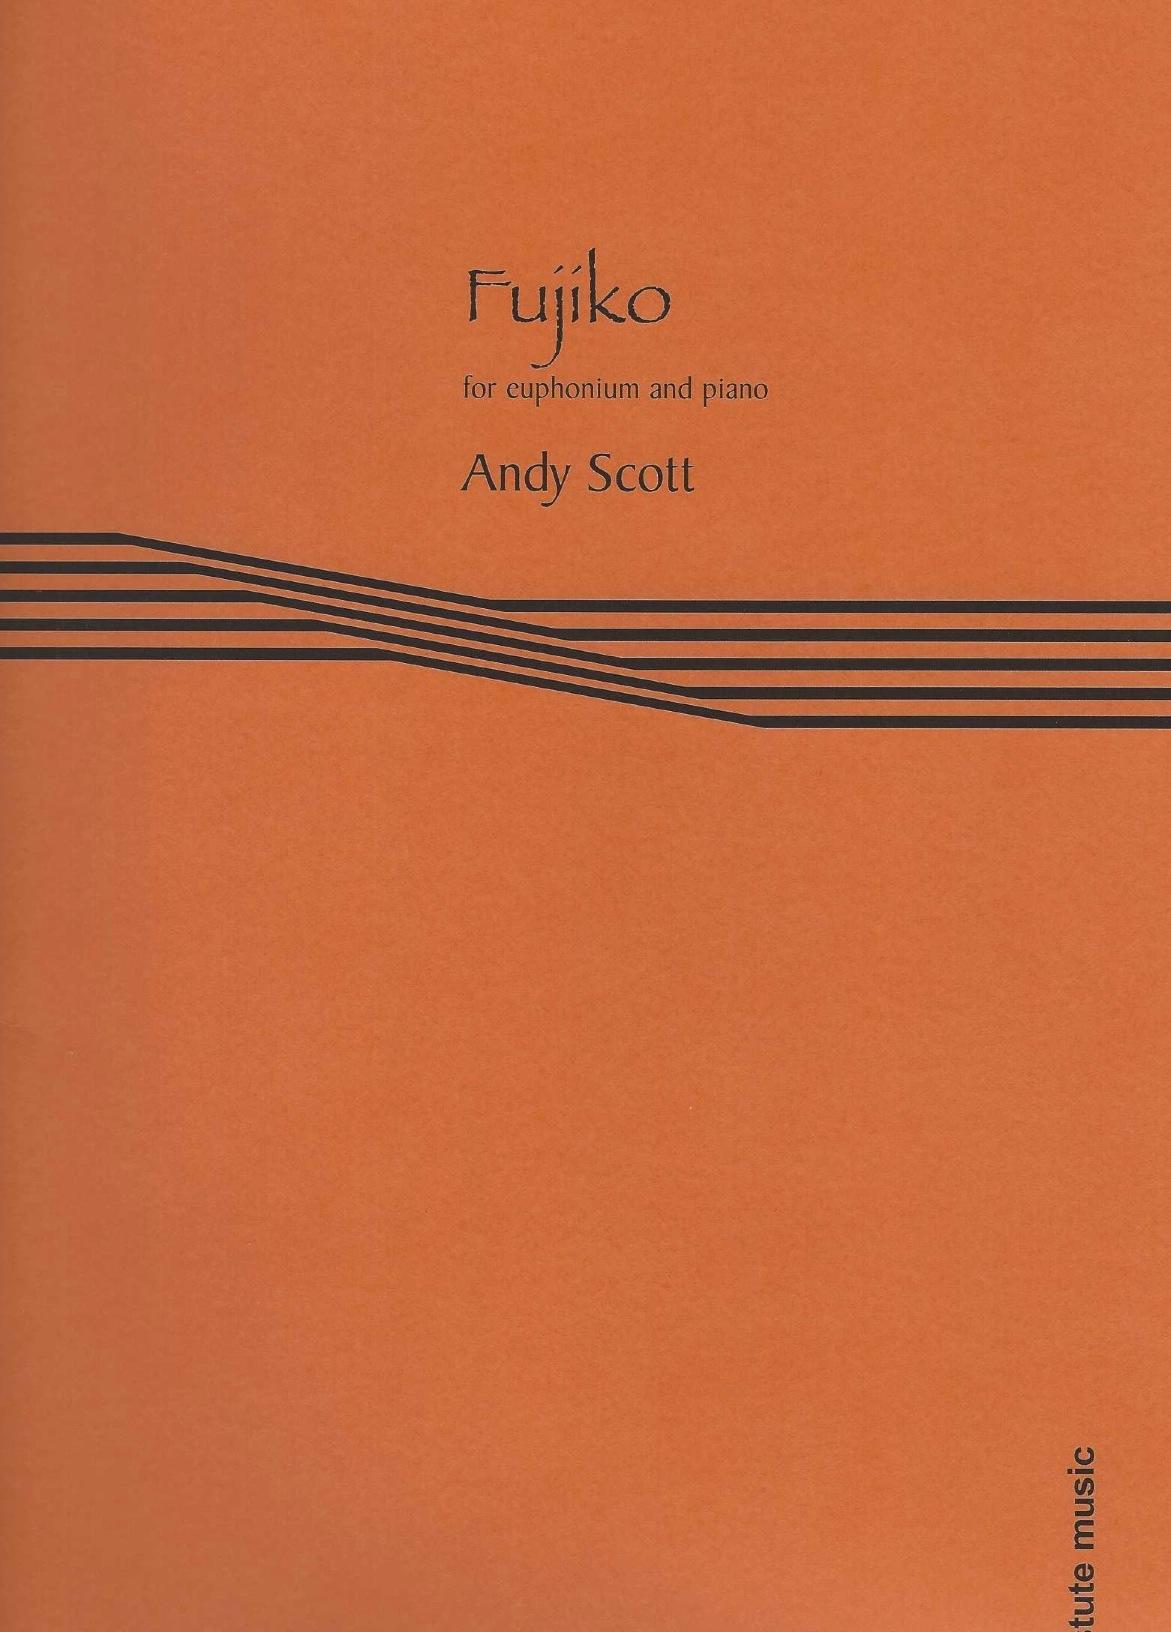 Fujiko - Andy Scott   Euphonium and Piano